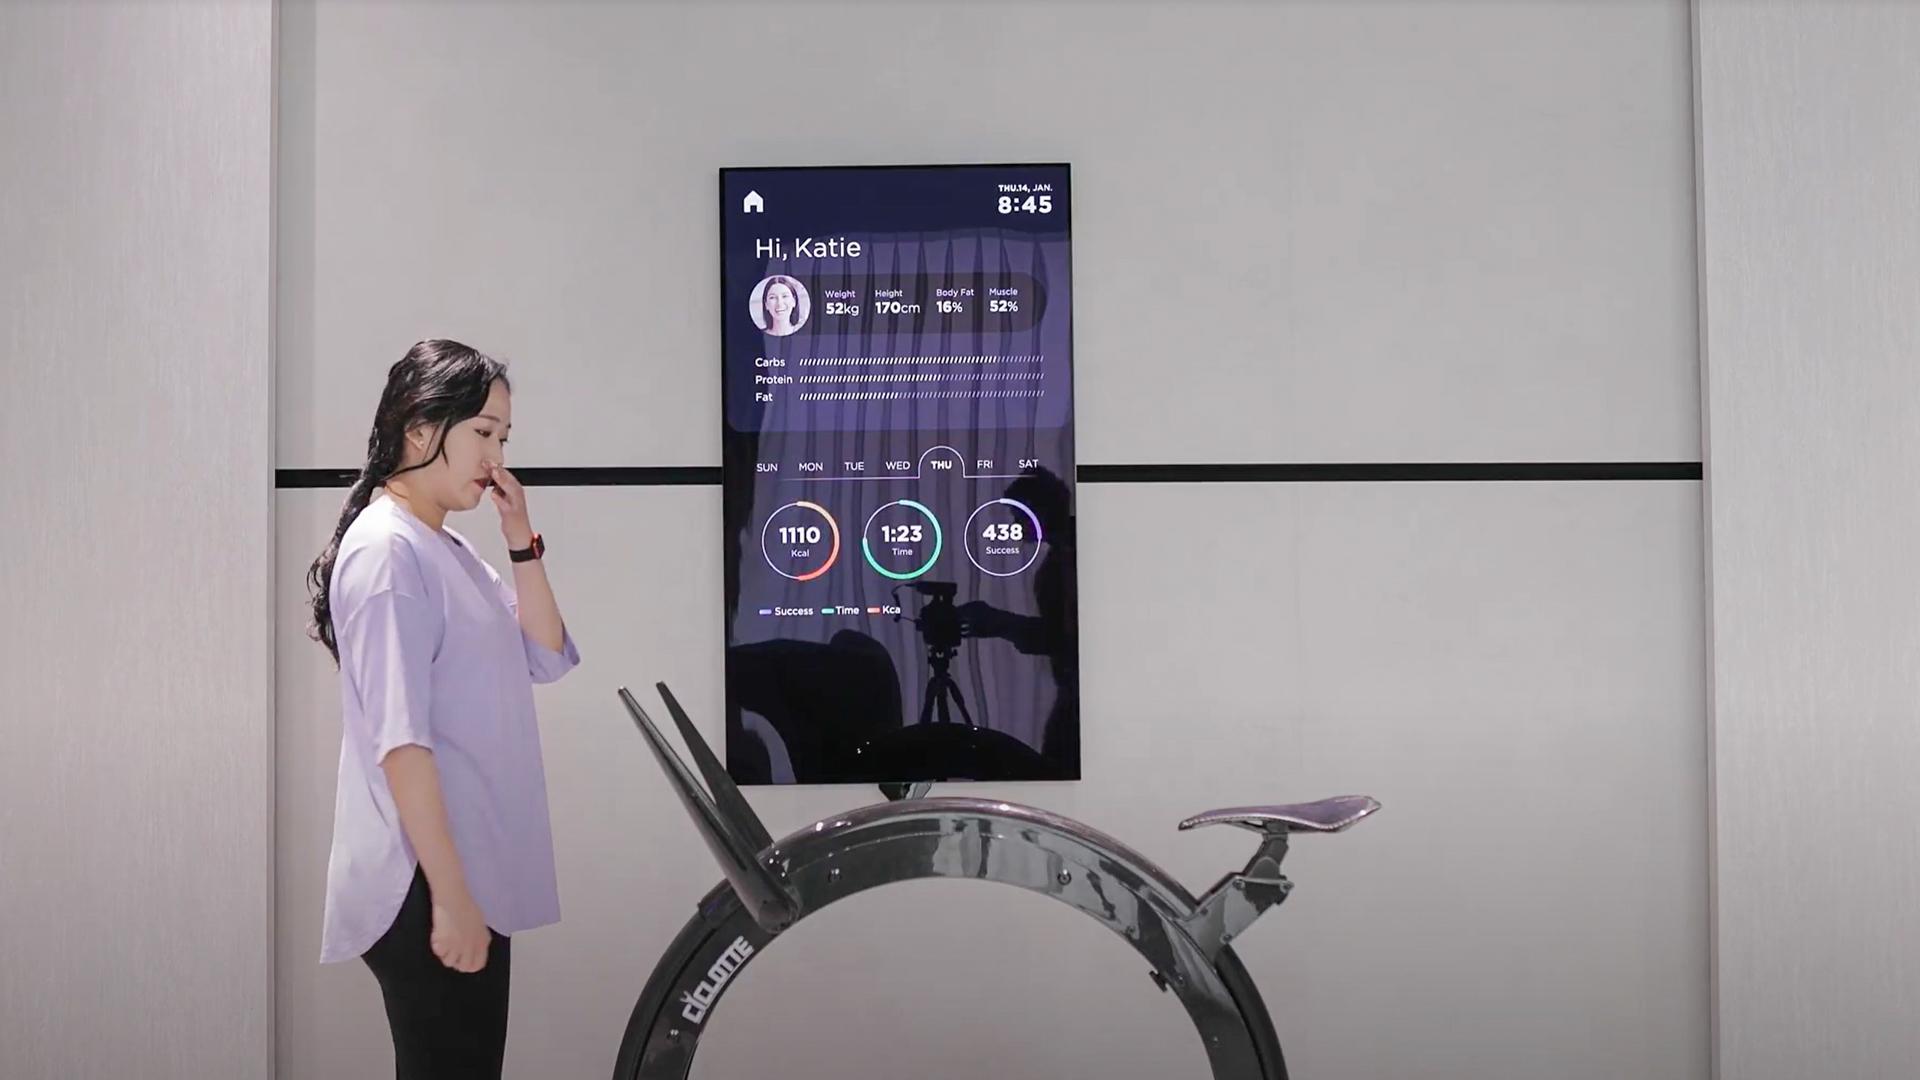 LG Smart Fitness TV CES 2021 2